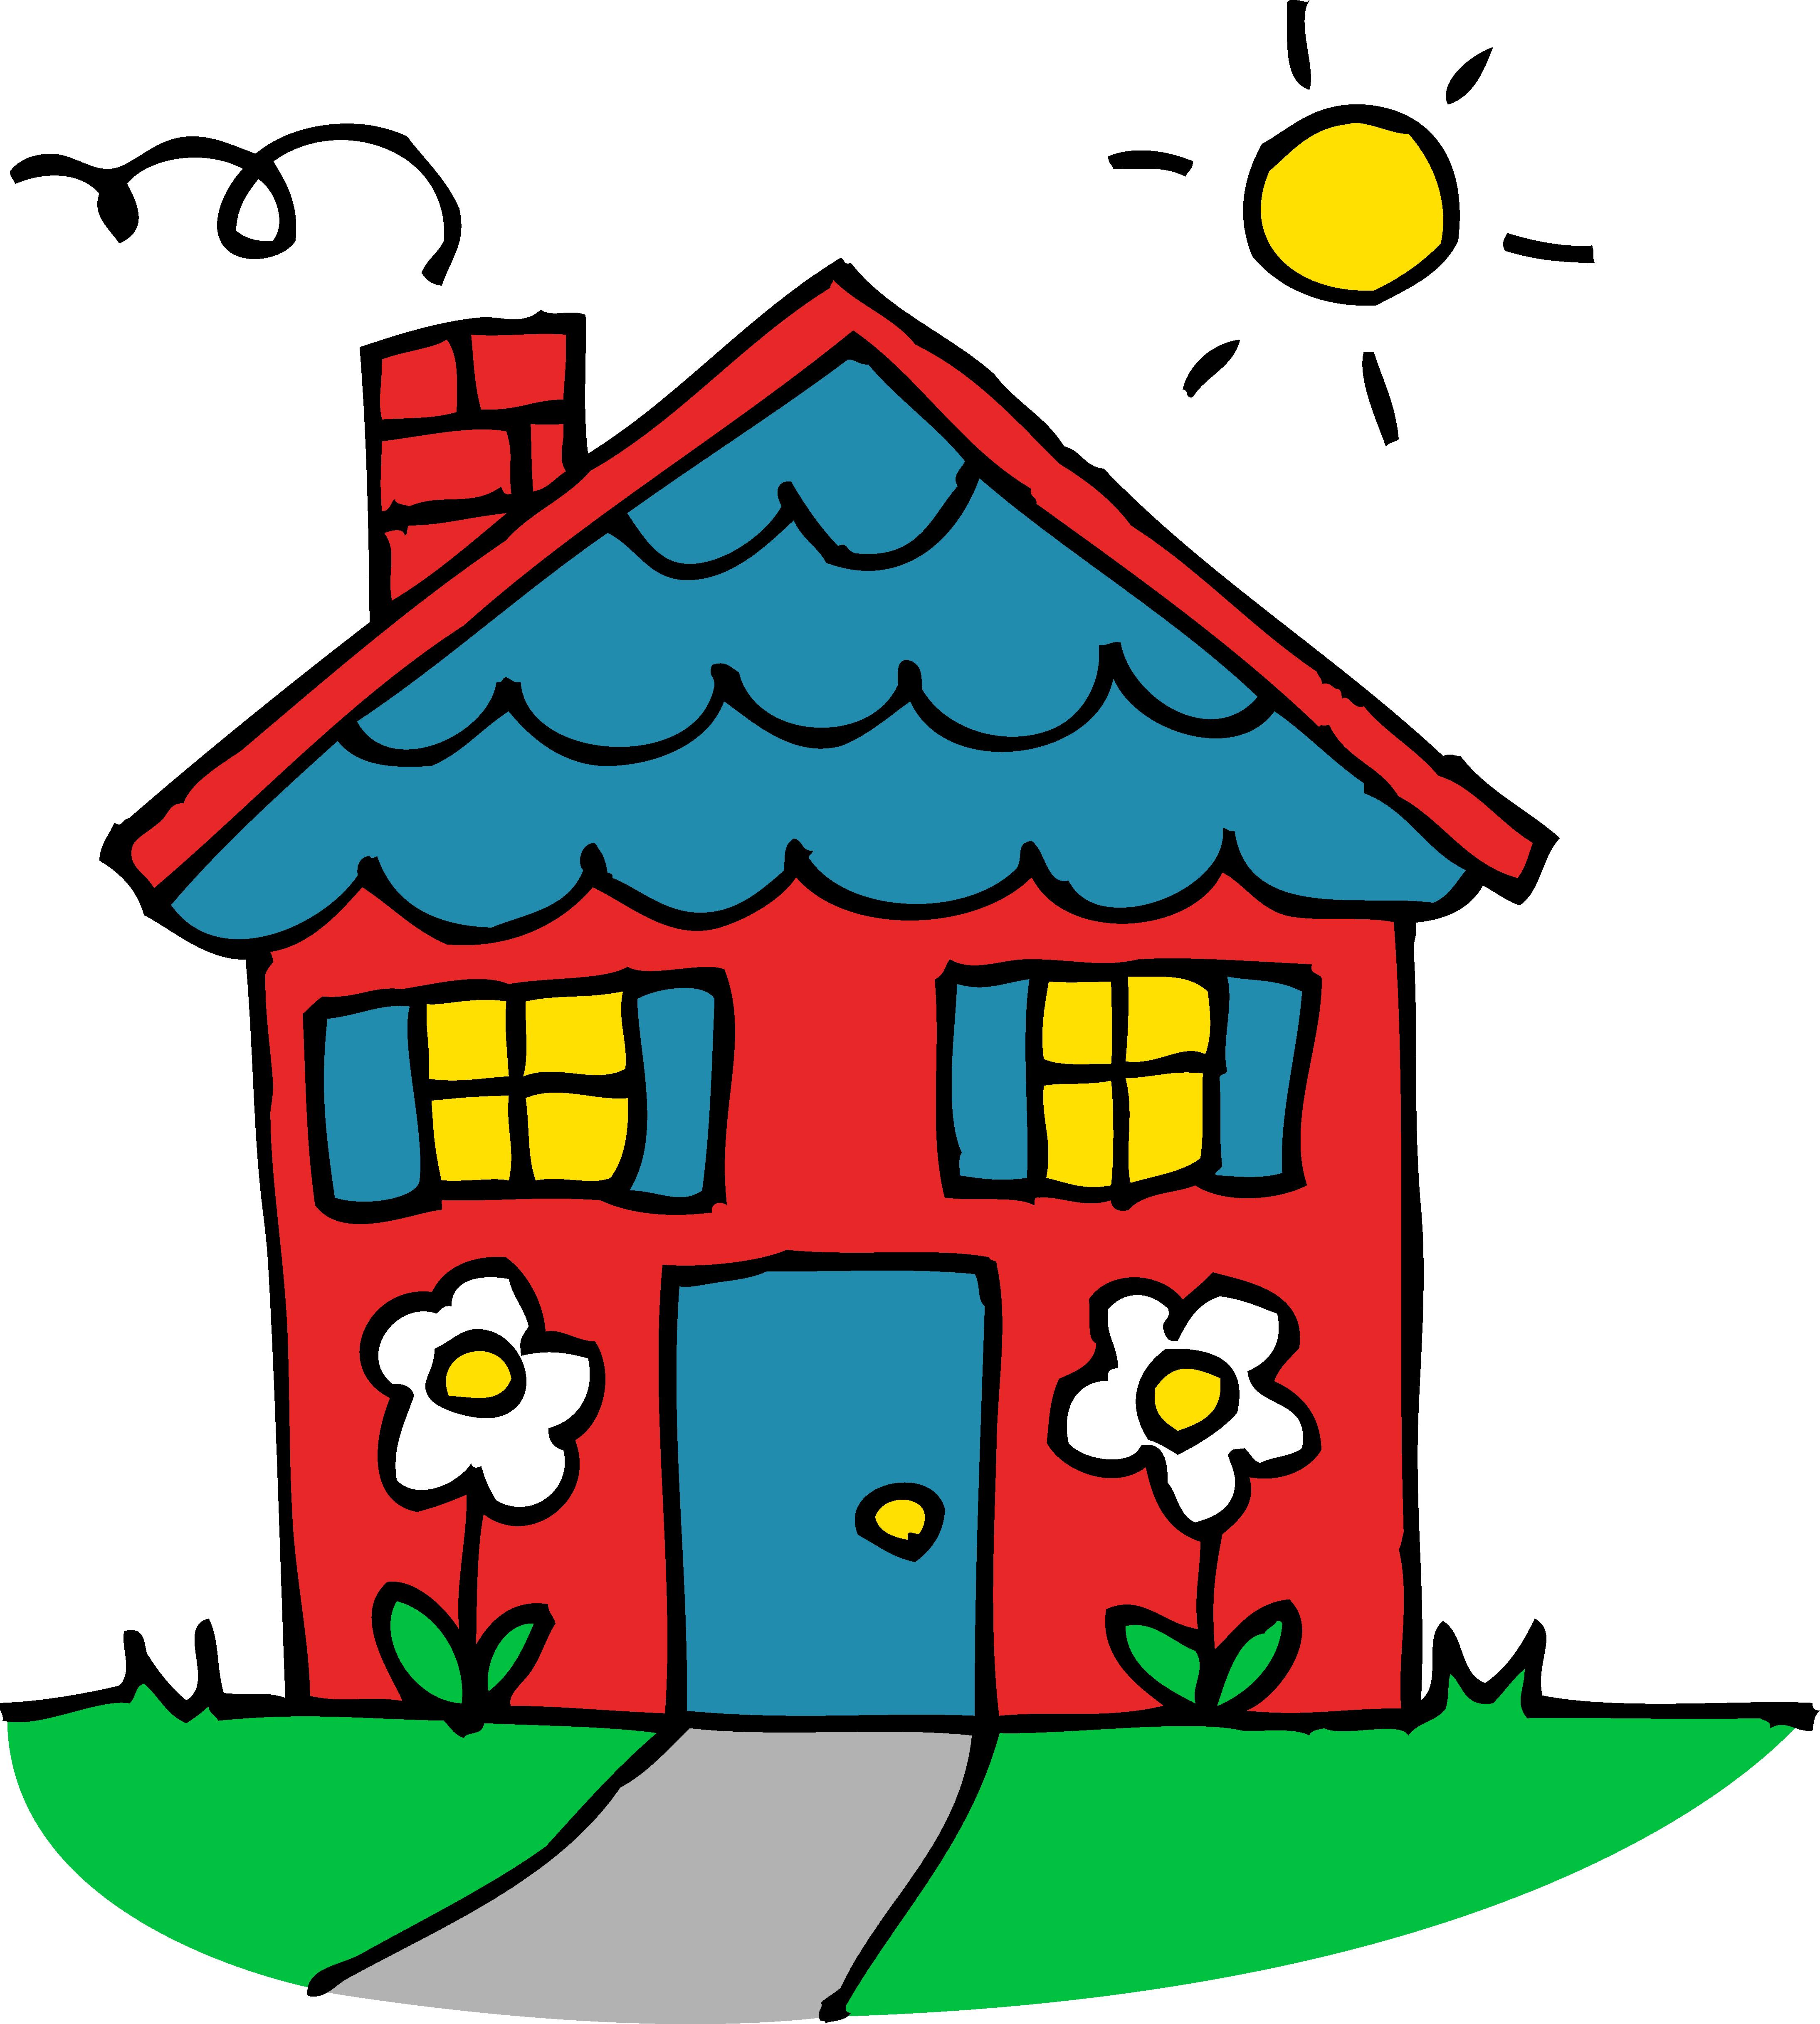 house clipart u0026middot; house clipart-house clipart u0026middot; house clipart-0